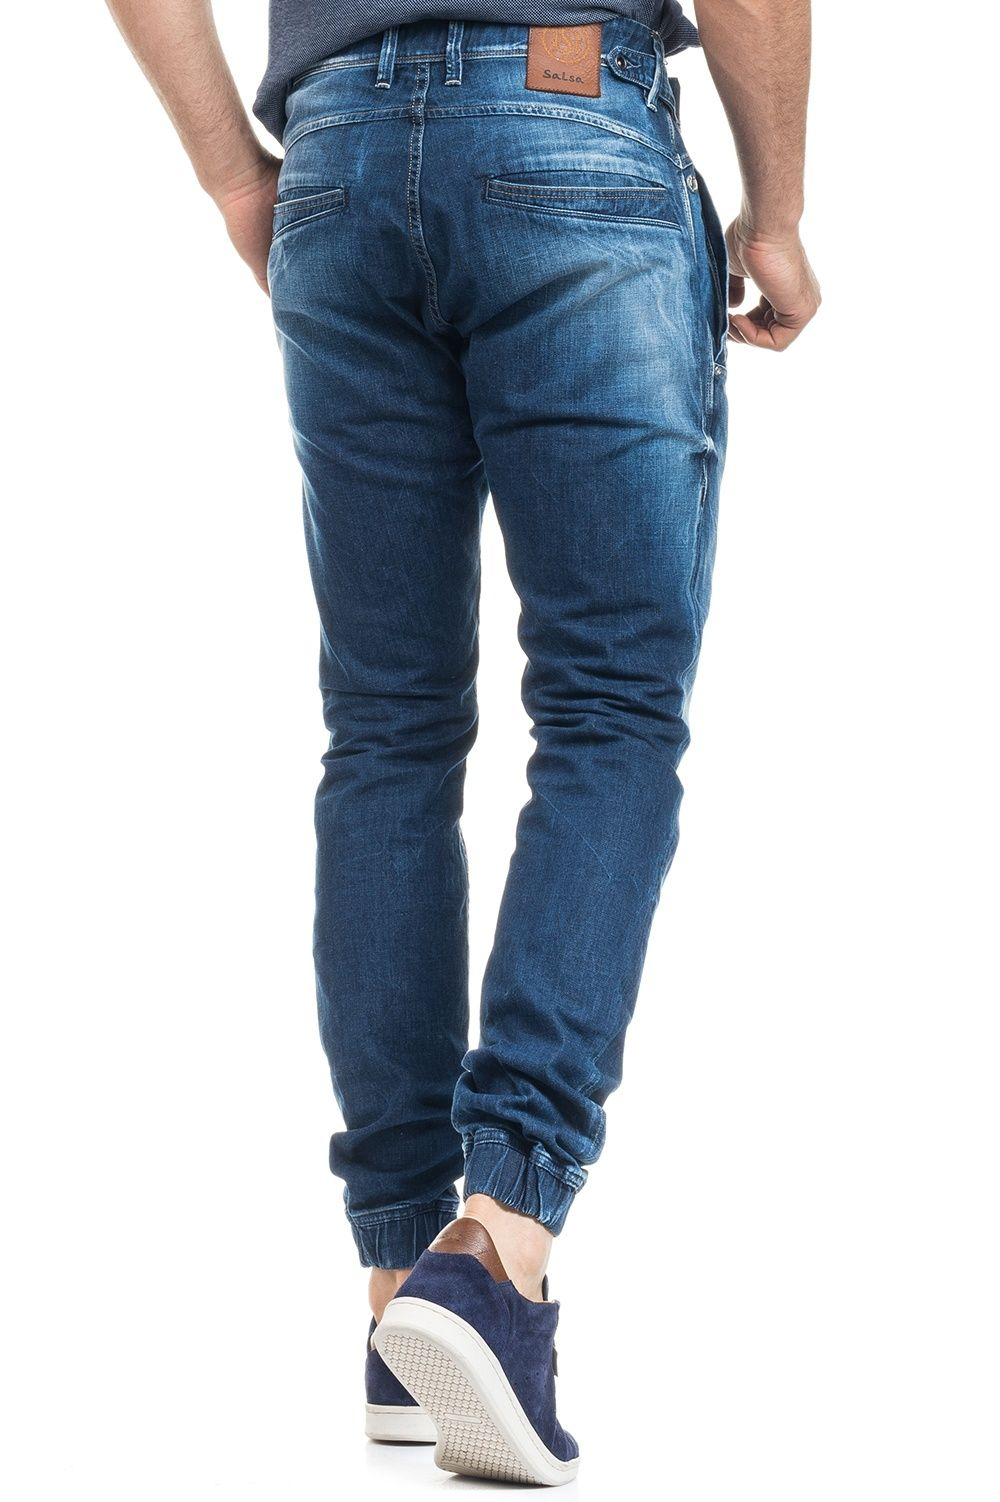 3d04cd18 Chad pantalones vaqueros 1st Level estilo chino in 2019 | Jeans ...